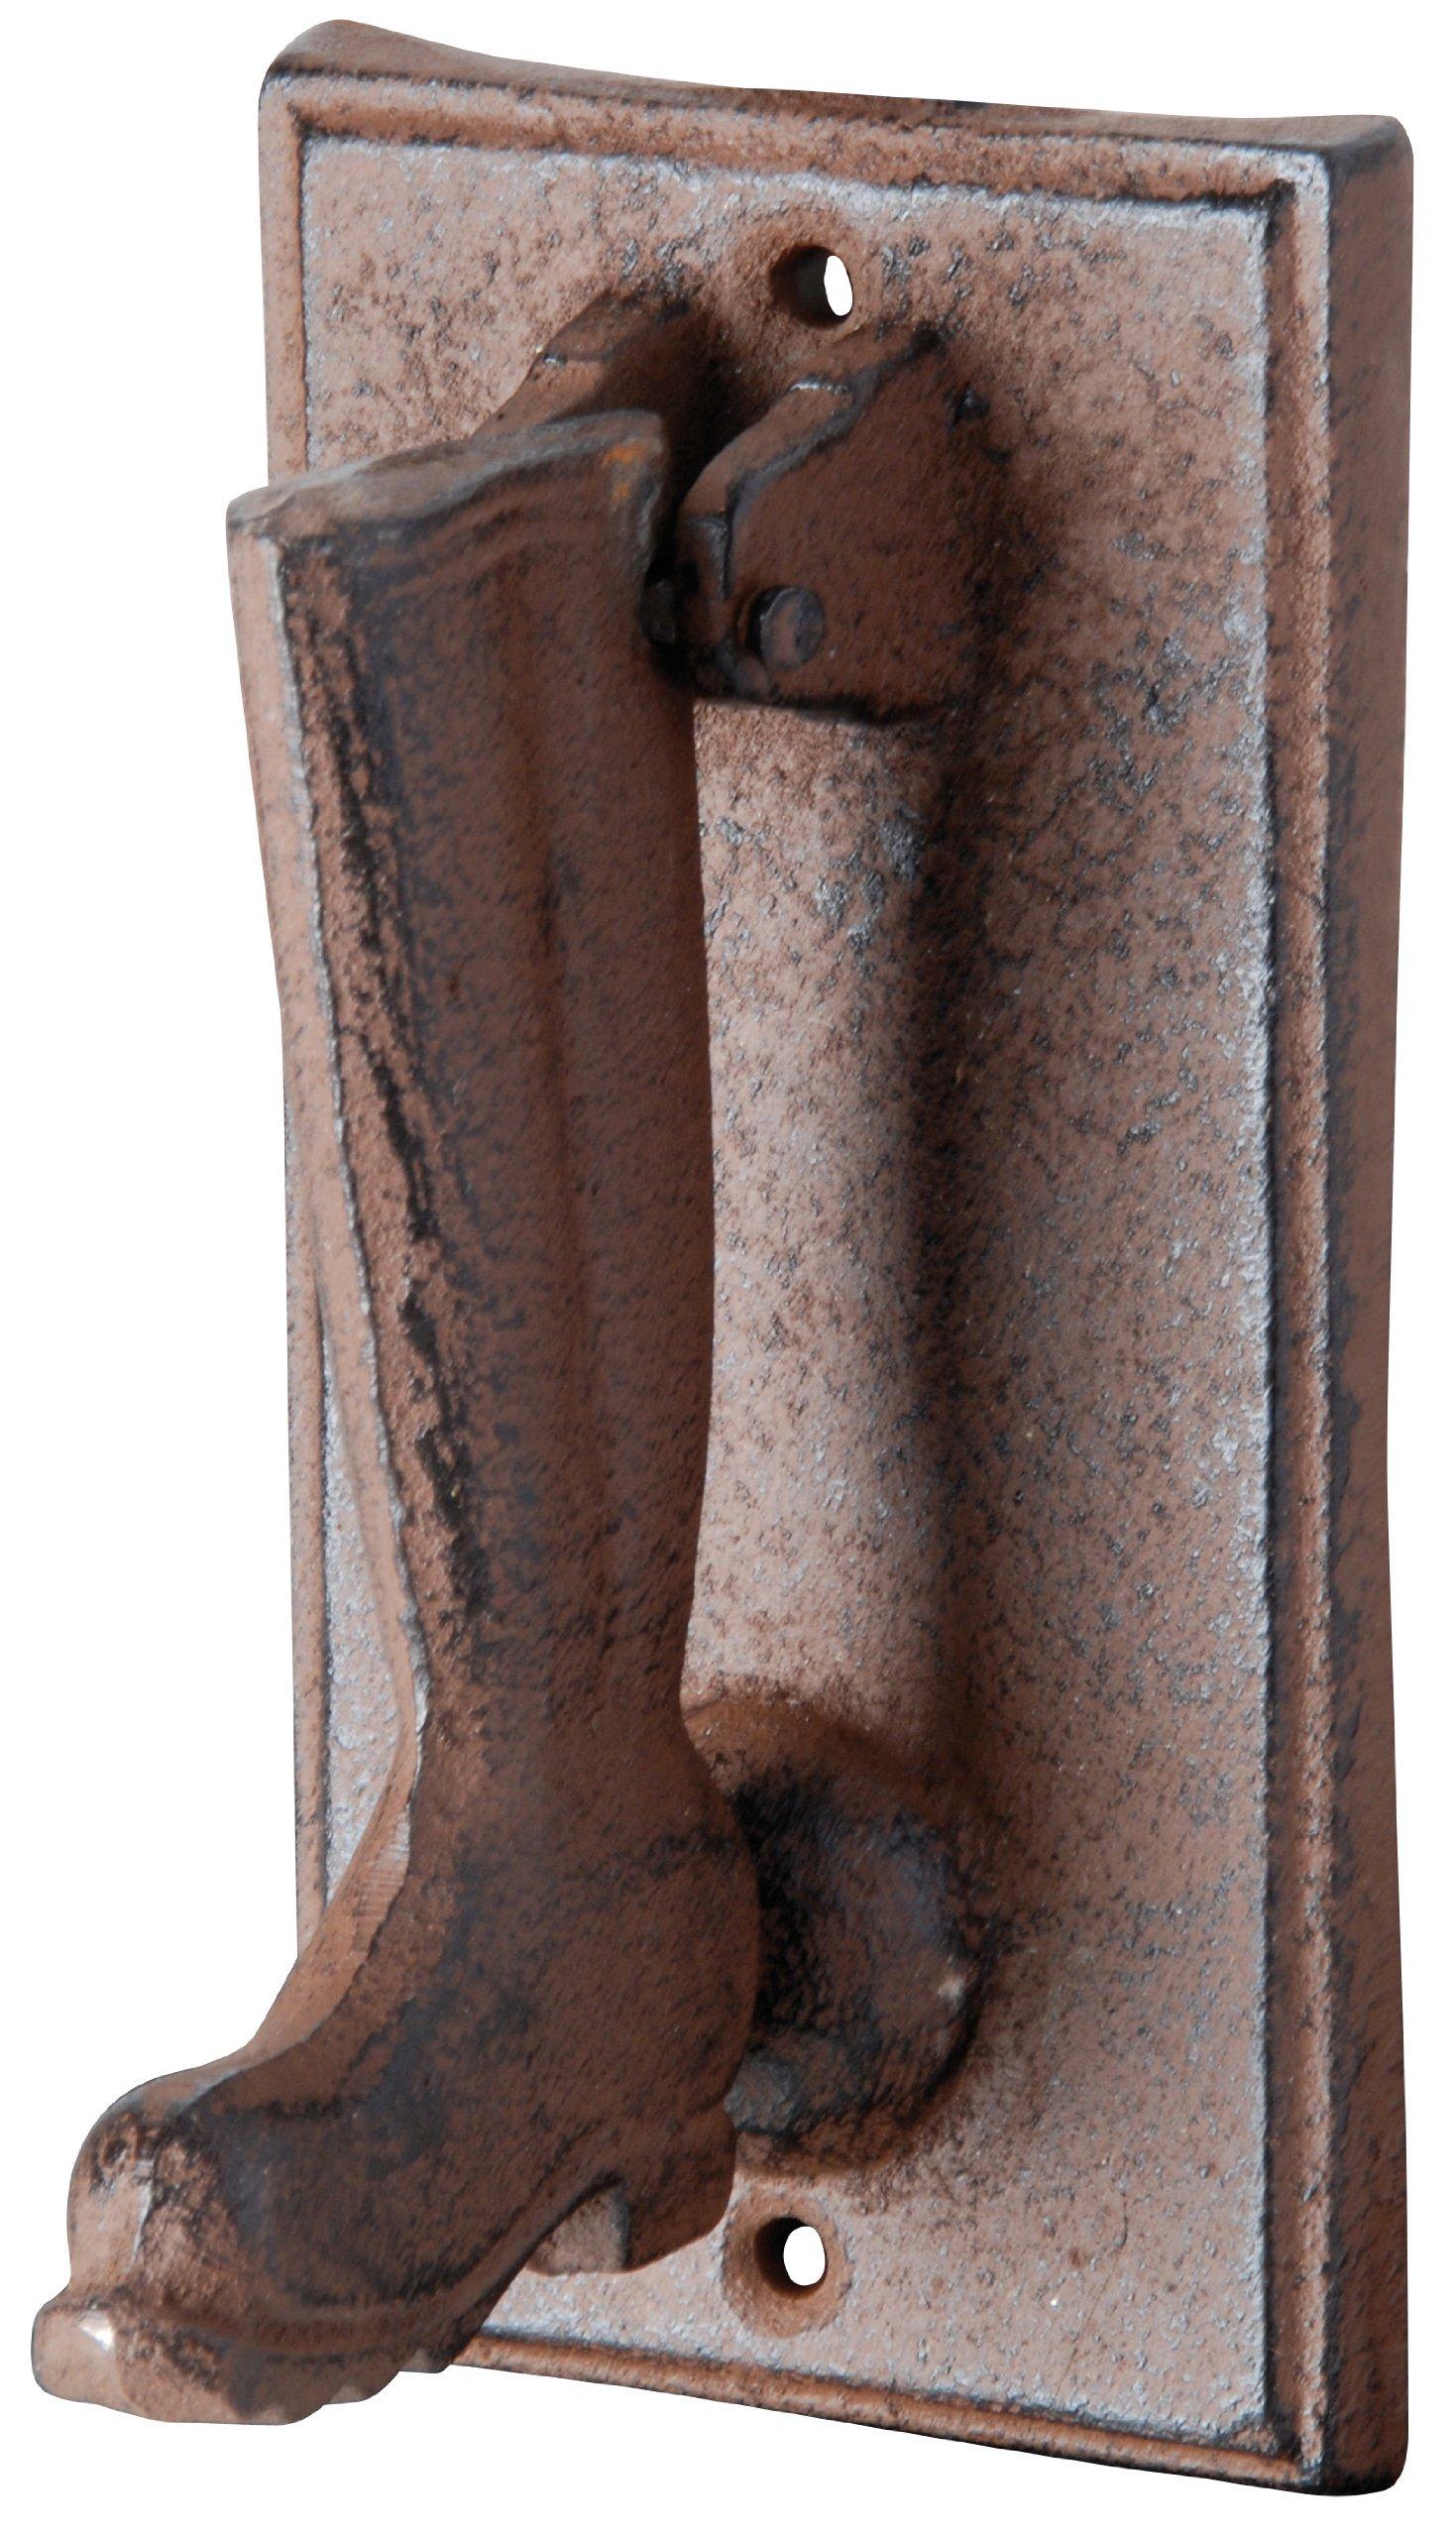 Esschert Design DB54 Cast Iron Boot Door Knocker